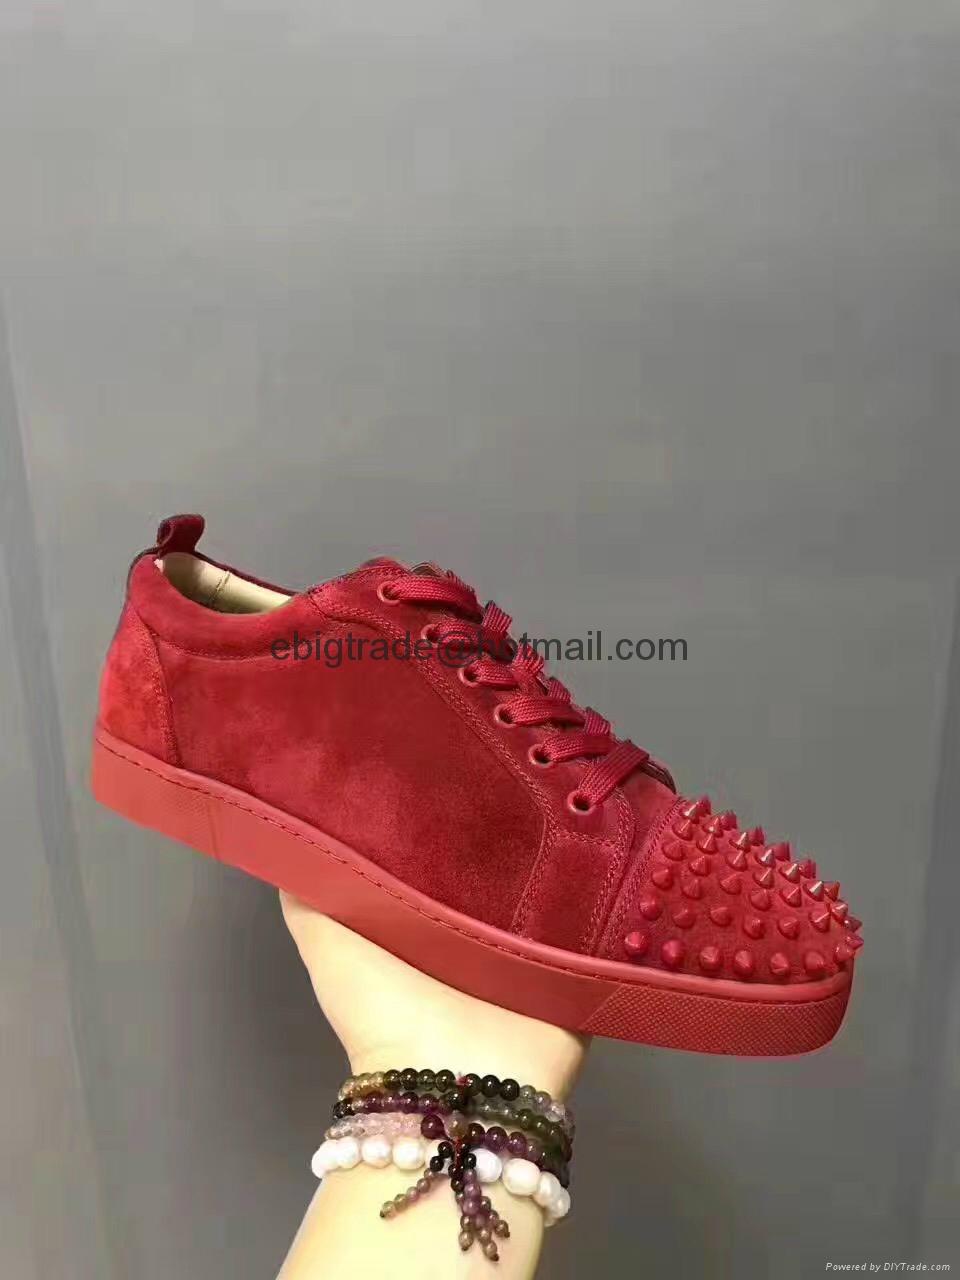 Cheap Christian Louboutin shoes for men christian louboutin sneakers for men 9